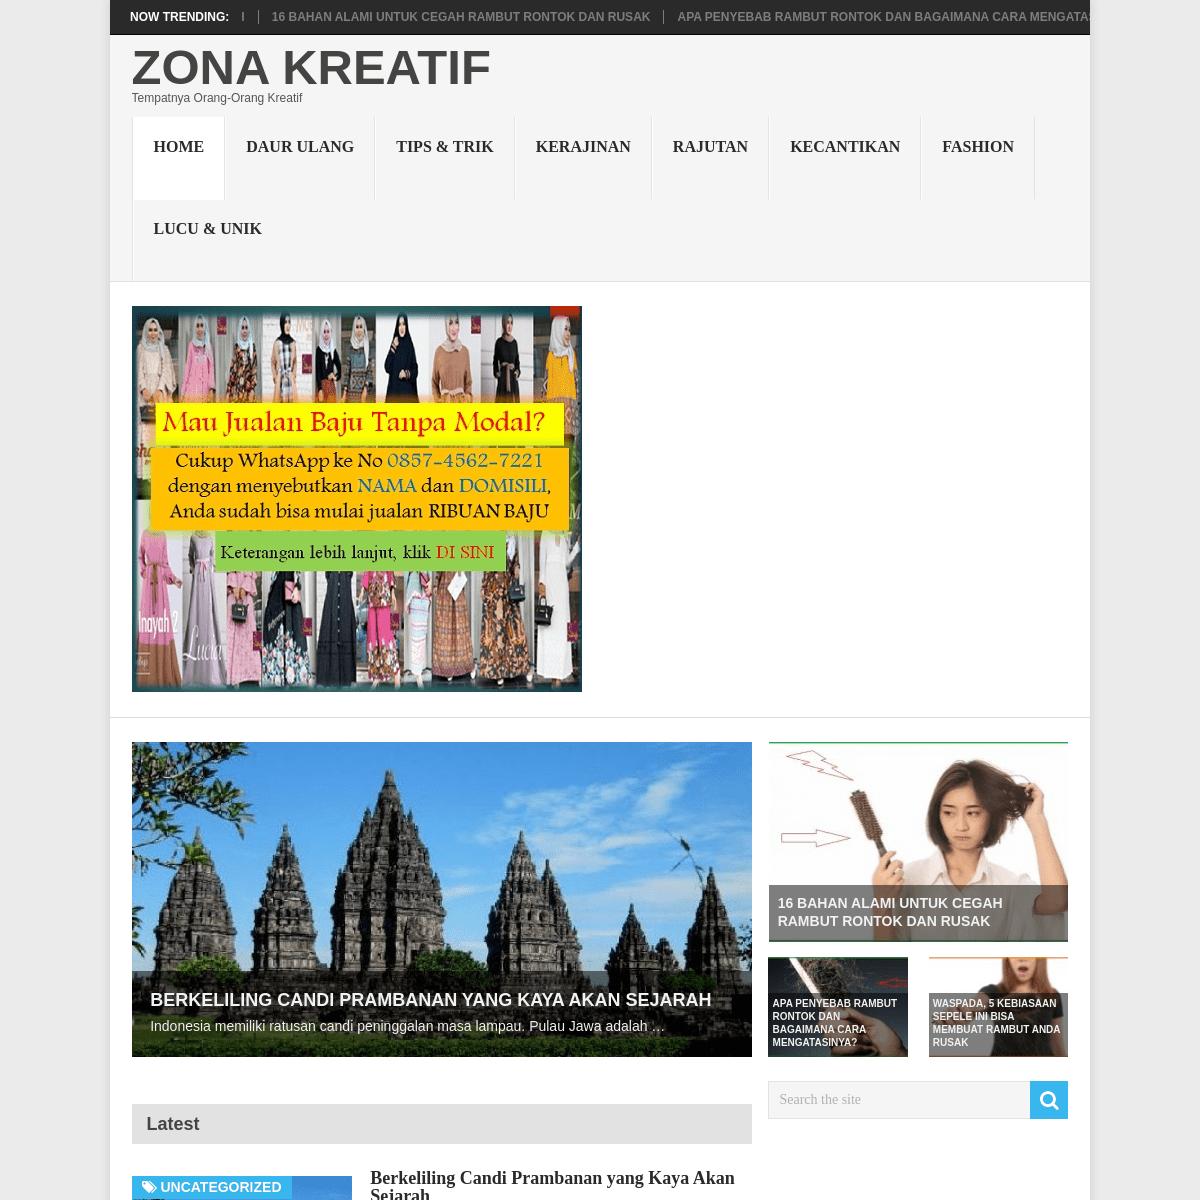 ArchiveBay.com - zonakreatif.com - ZonaKreatif.com l Tempatnya Orang-Orang Kreatif